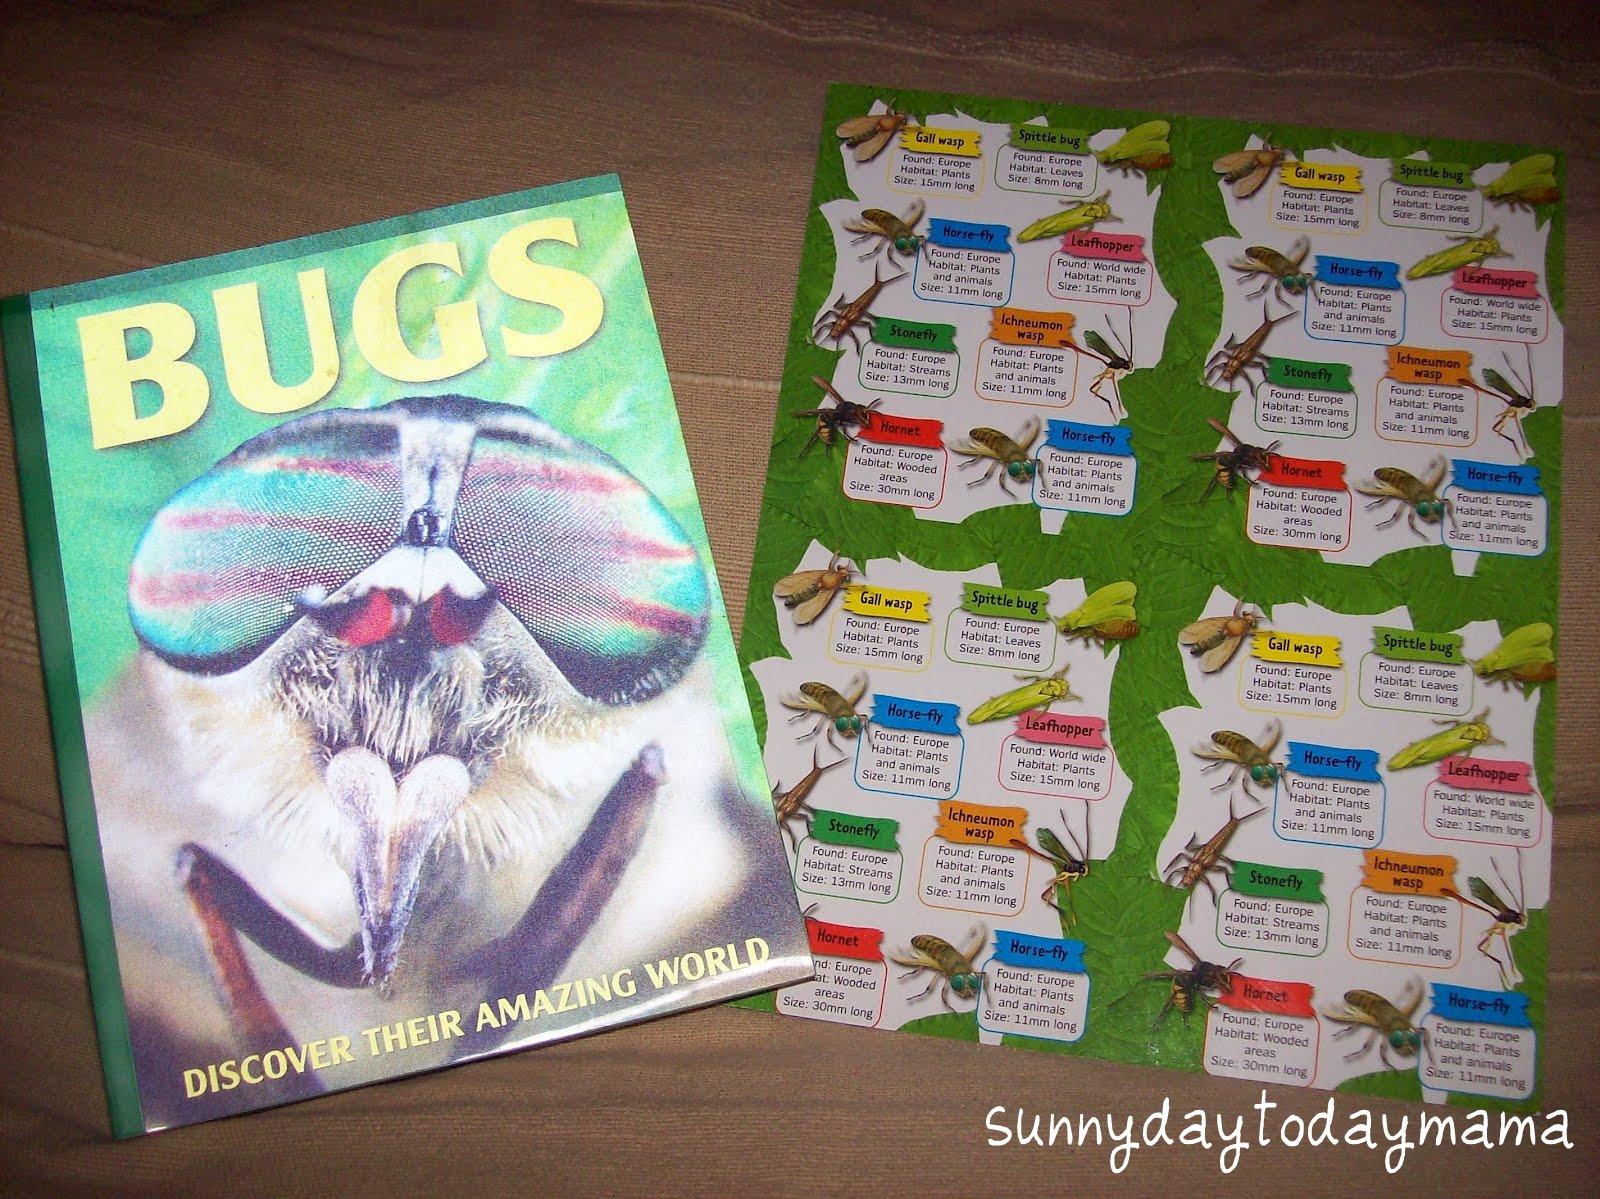 Sunnydaytodaymama A Homemade Nature Study Kit And An I Spy Wild Flowers Giveaway